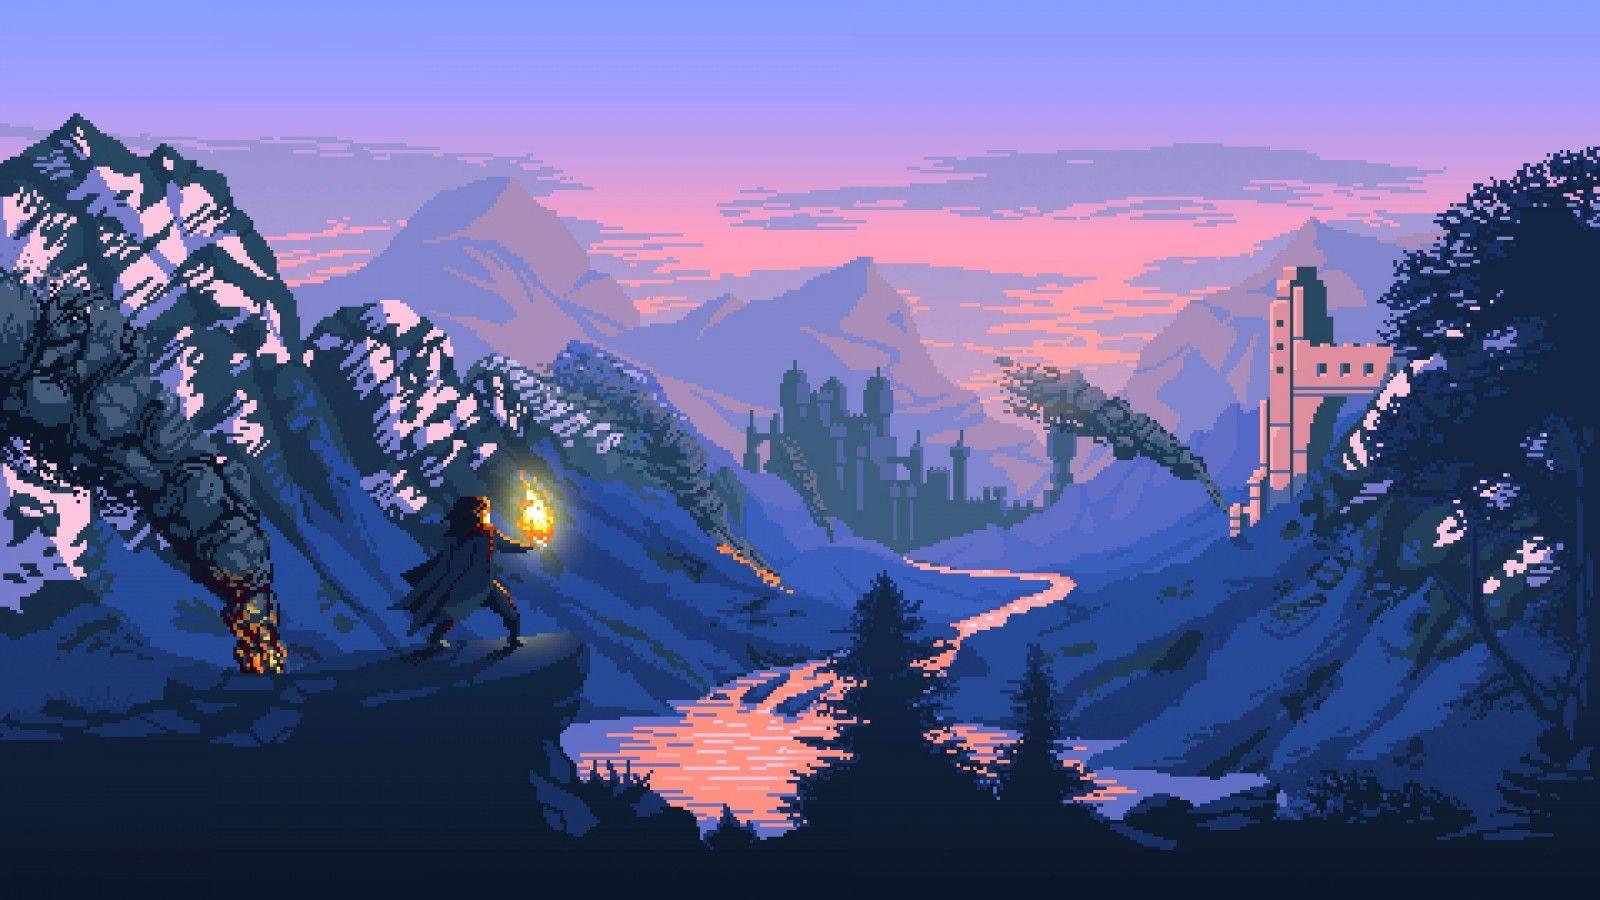 mountains digital art fantasy art pixel art castle